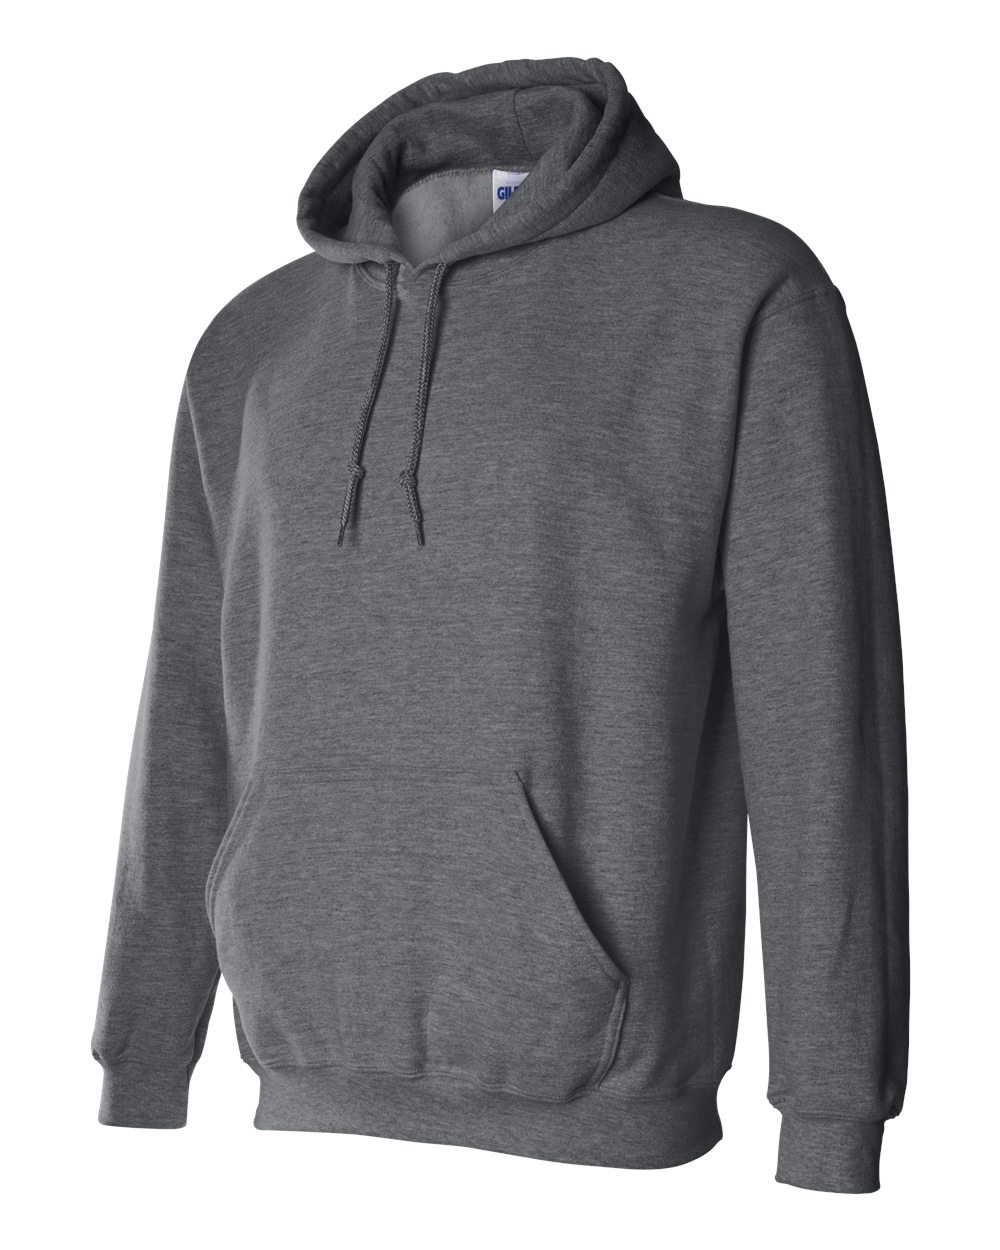 Gildan Heavy Blend Hooded Sweatshirt GI18500 Dark Heather Grey